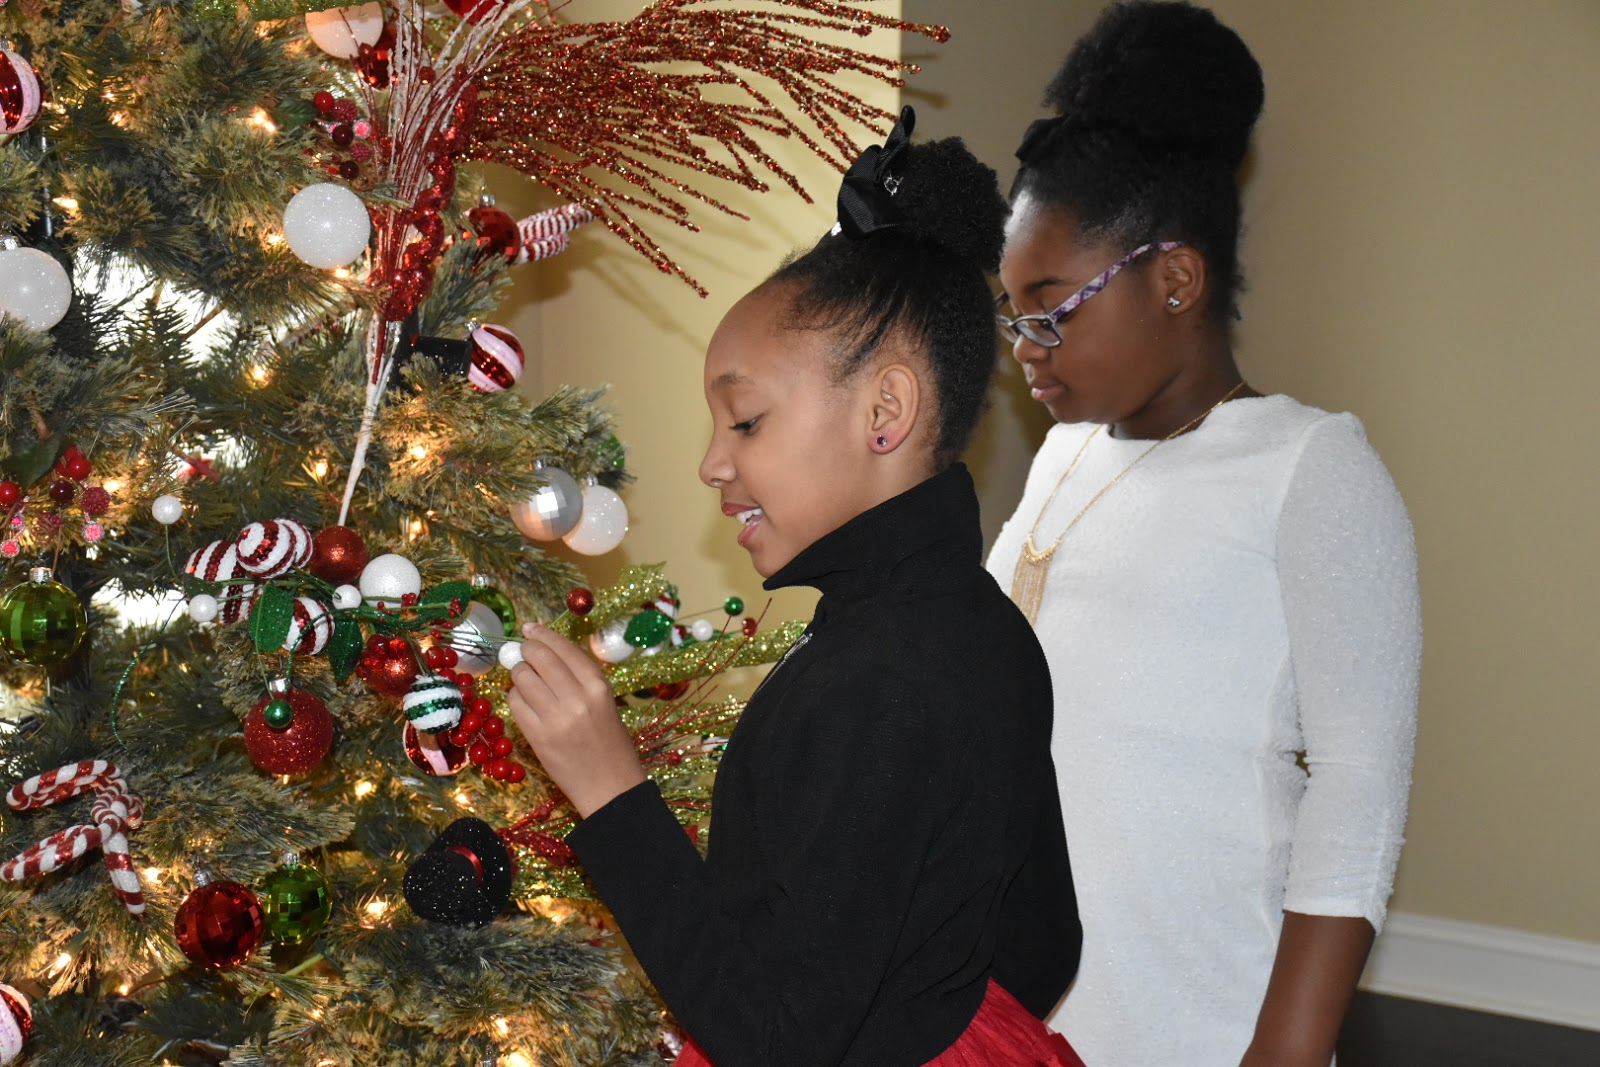 The Girls' Christmas Wish List  via  www.productreviewmom.com